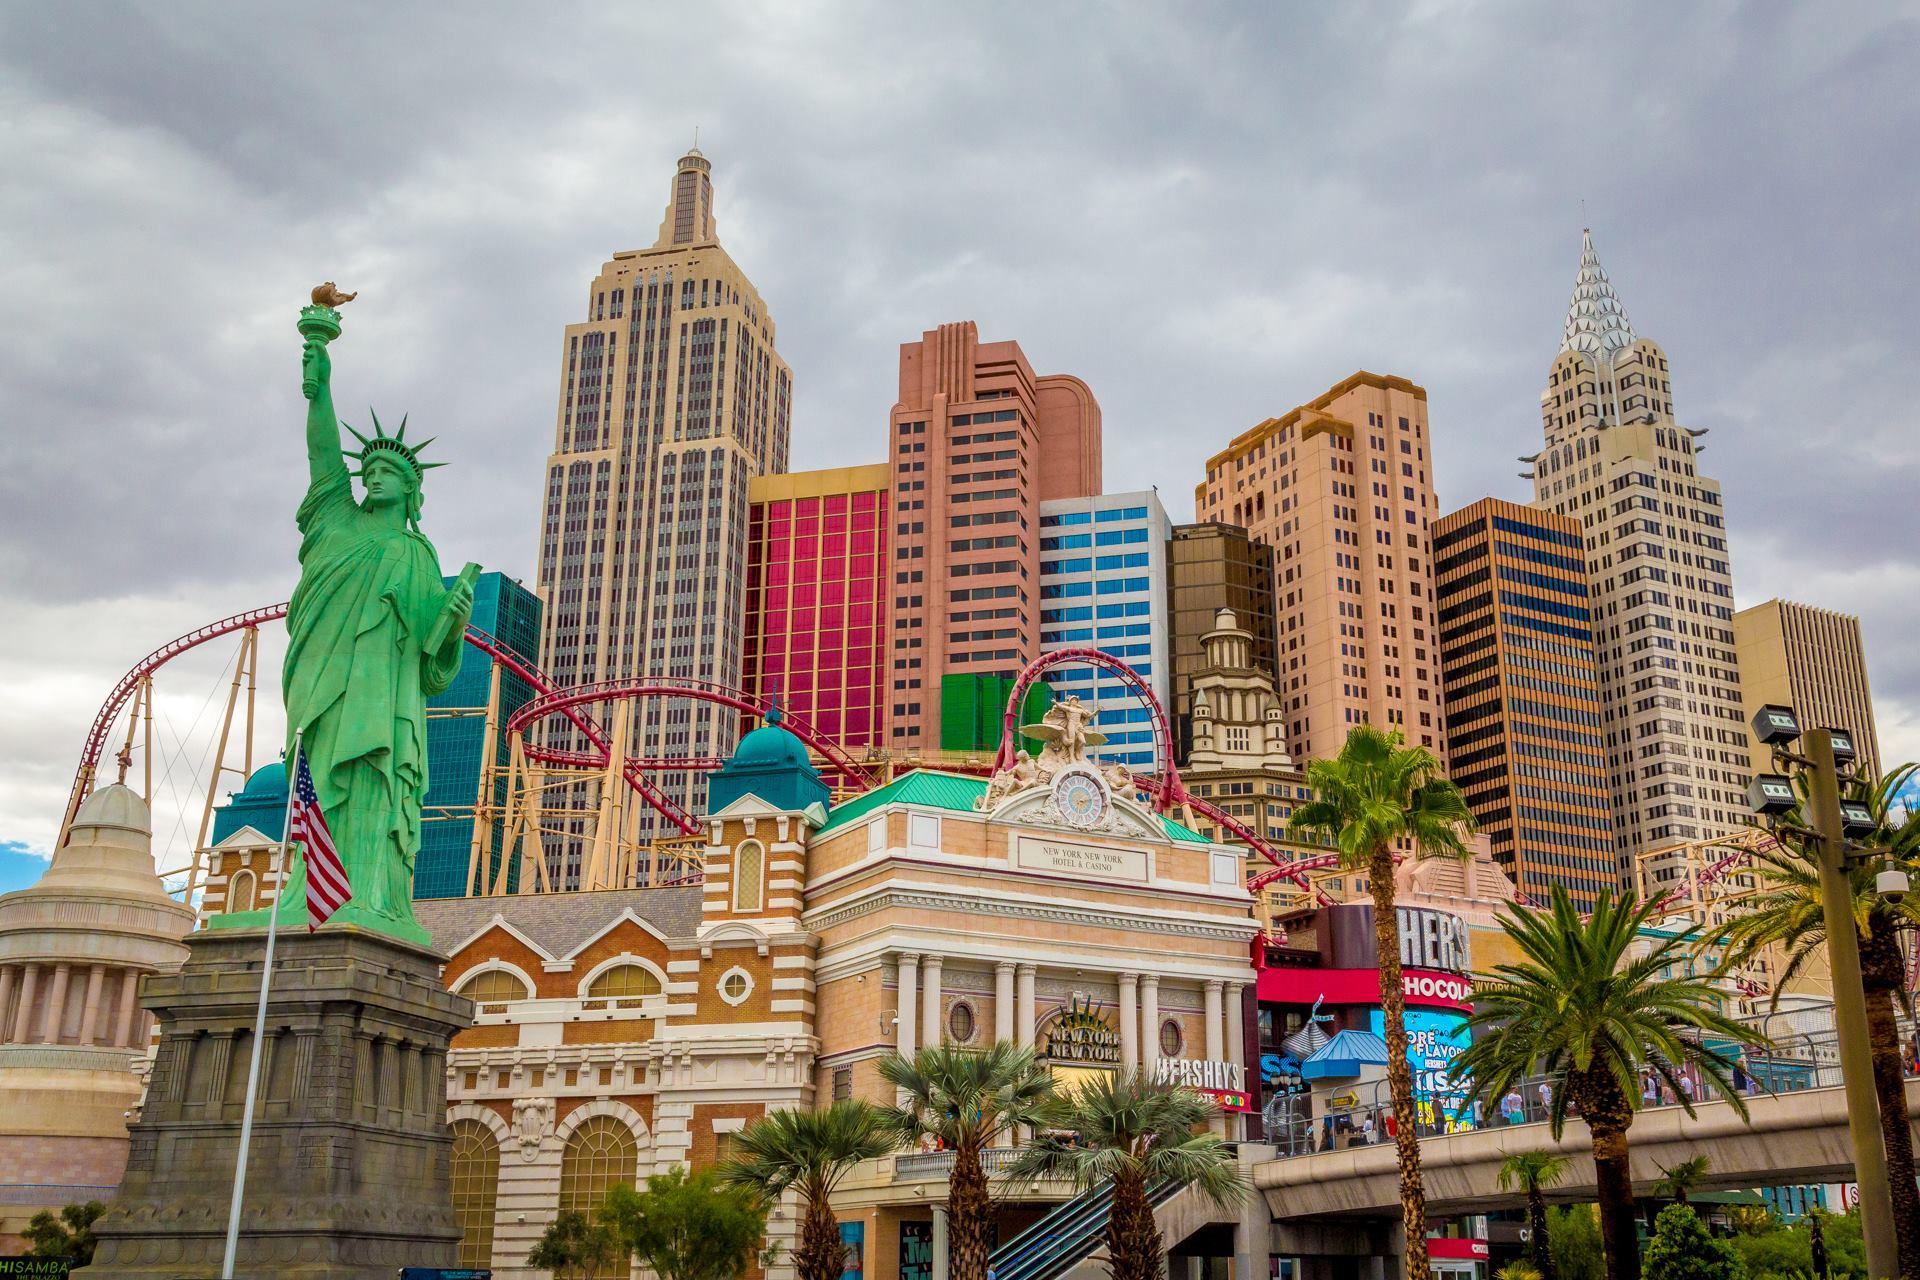 New York in Vegas -  by D Scott Smith